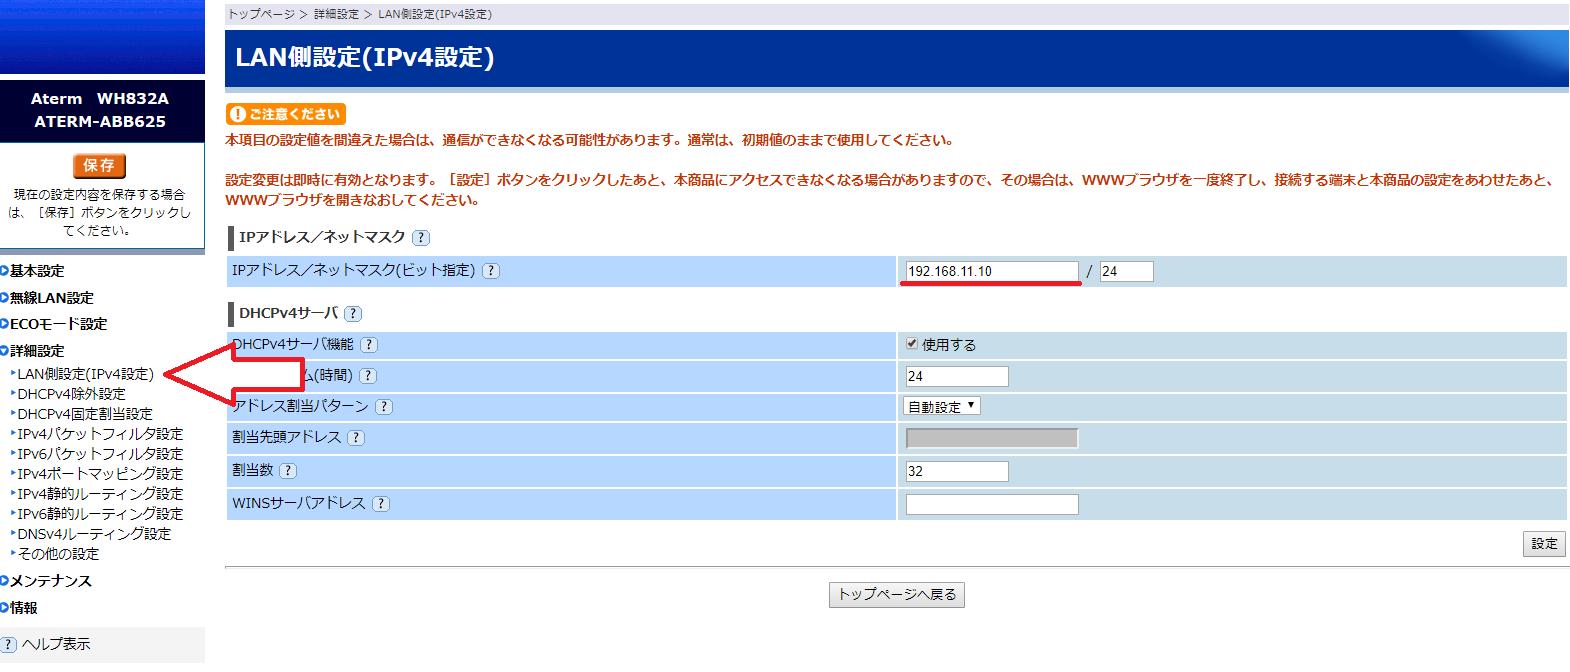 NAS】LS-WV2 0TL/R1のHDD無しに新たにHDDを突っ込んだ話